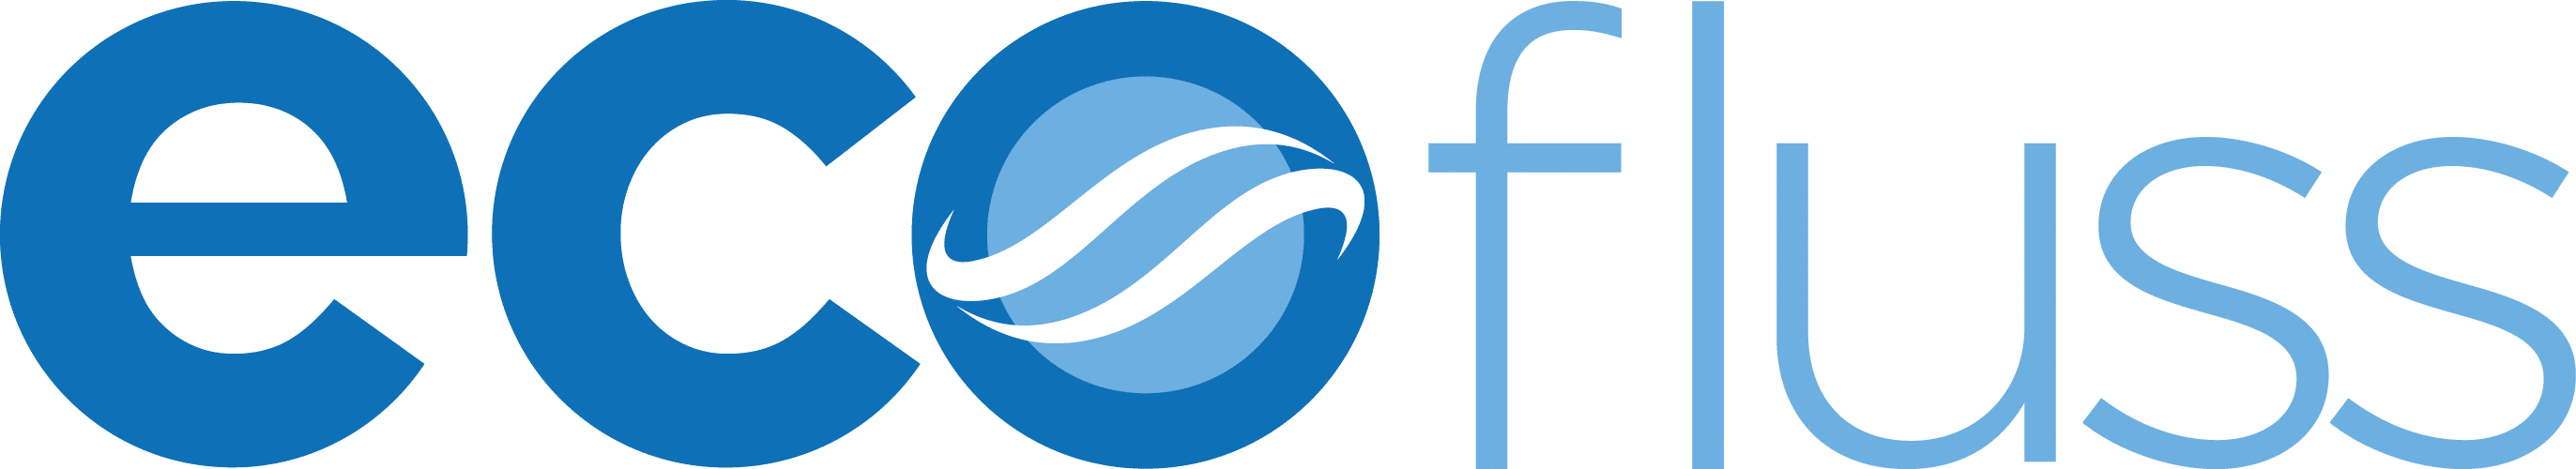 ecofluss logo